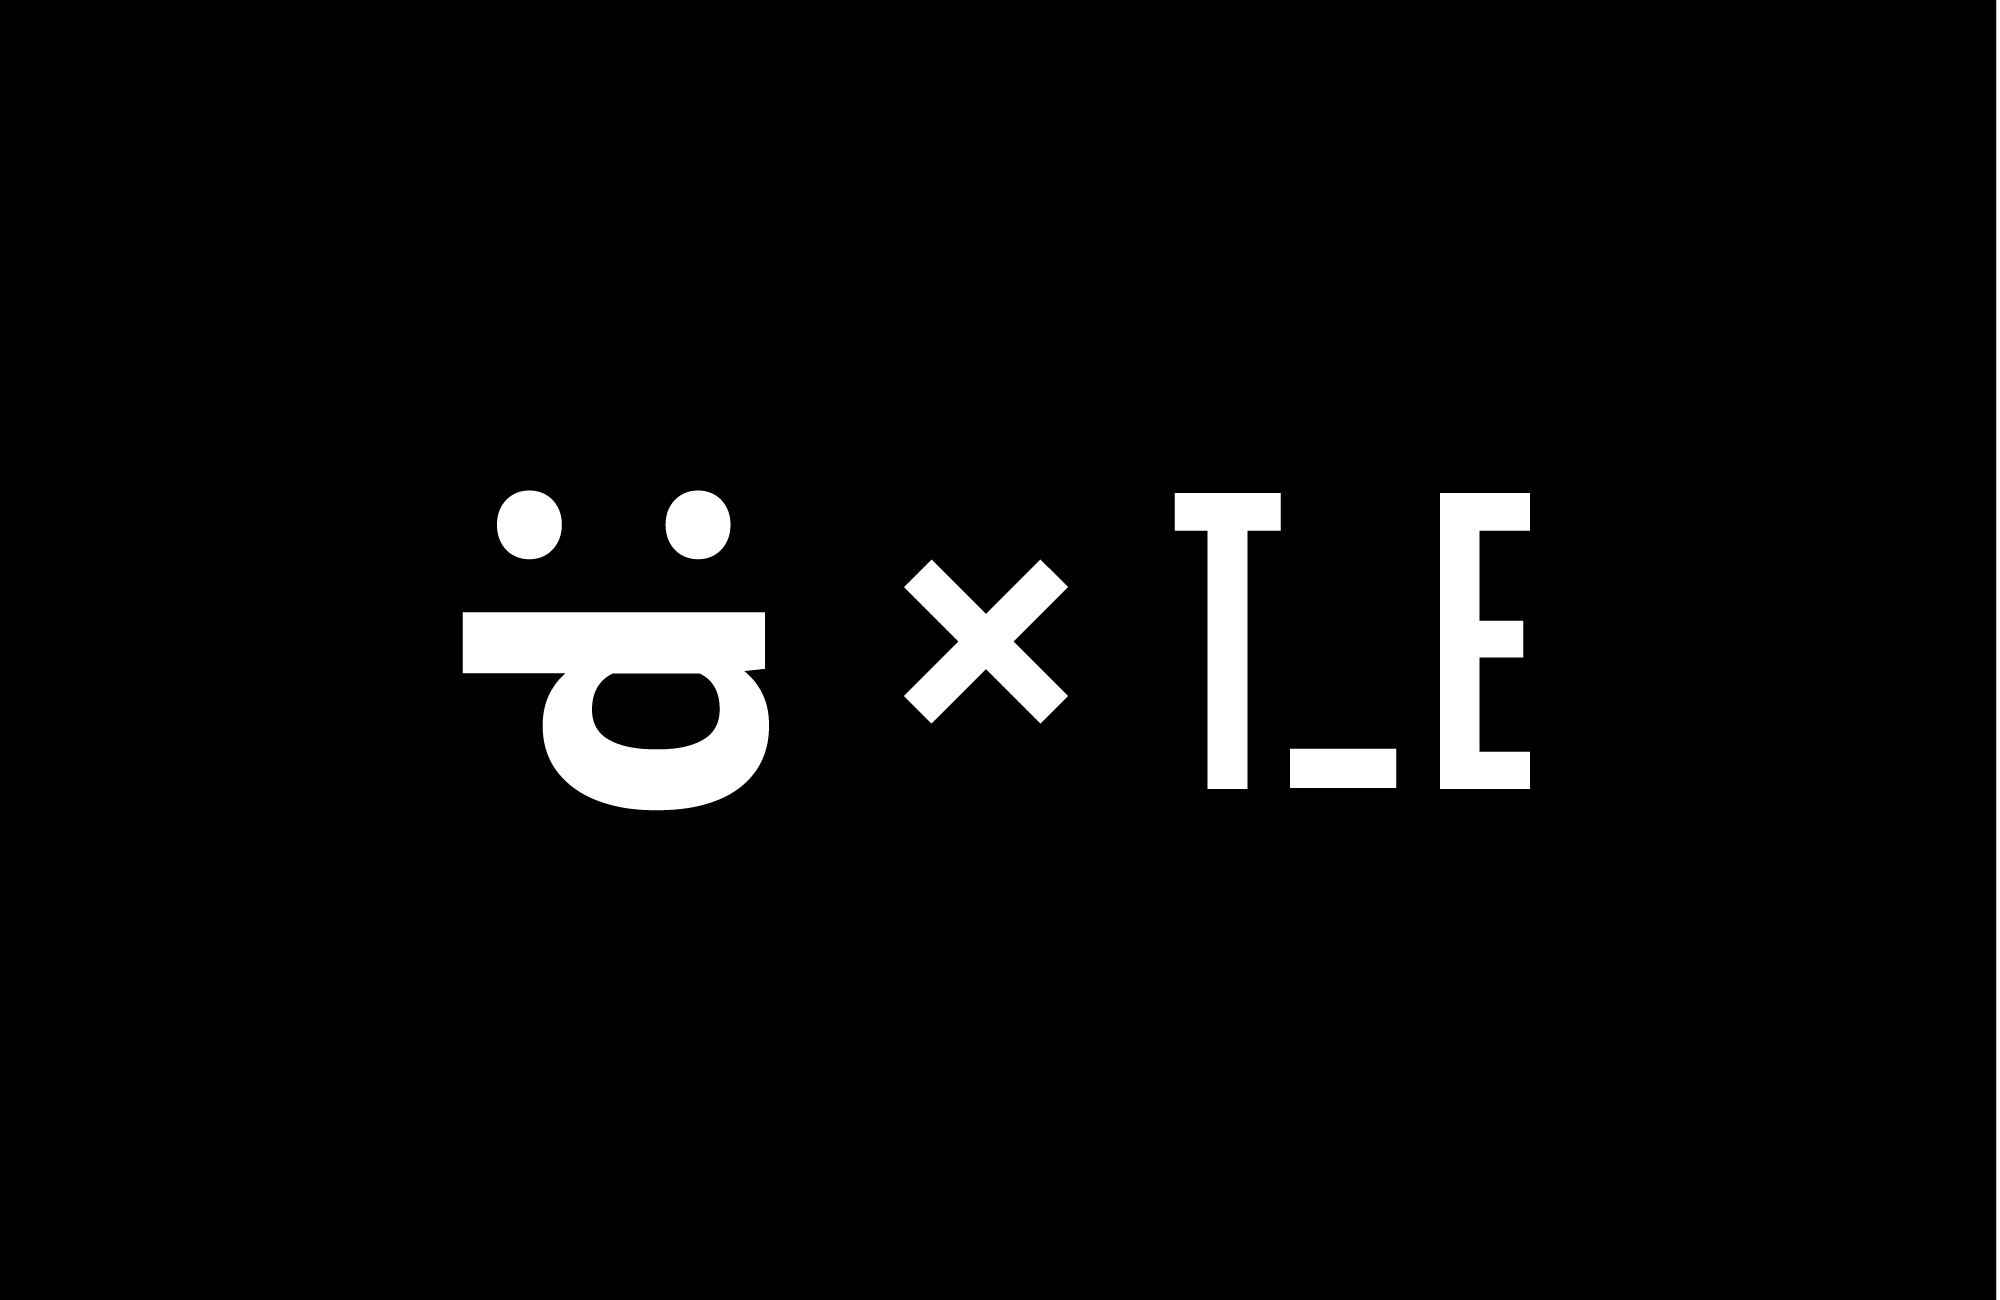 peersXterritory_CoCreation_Teaser_01